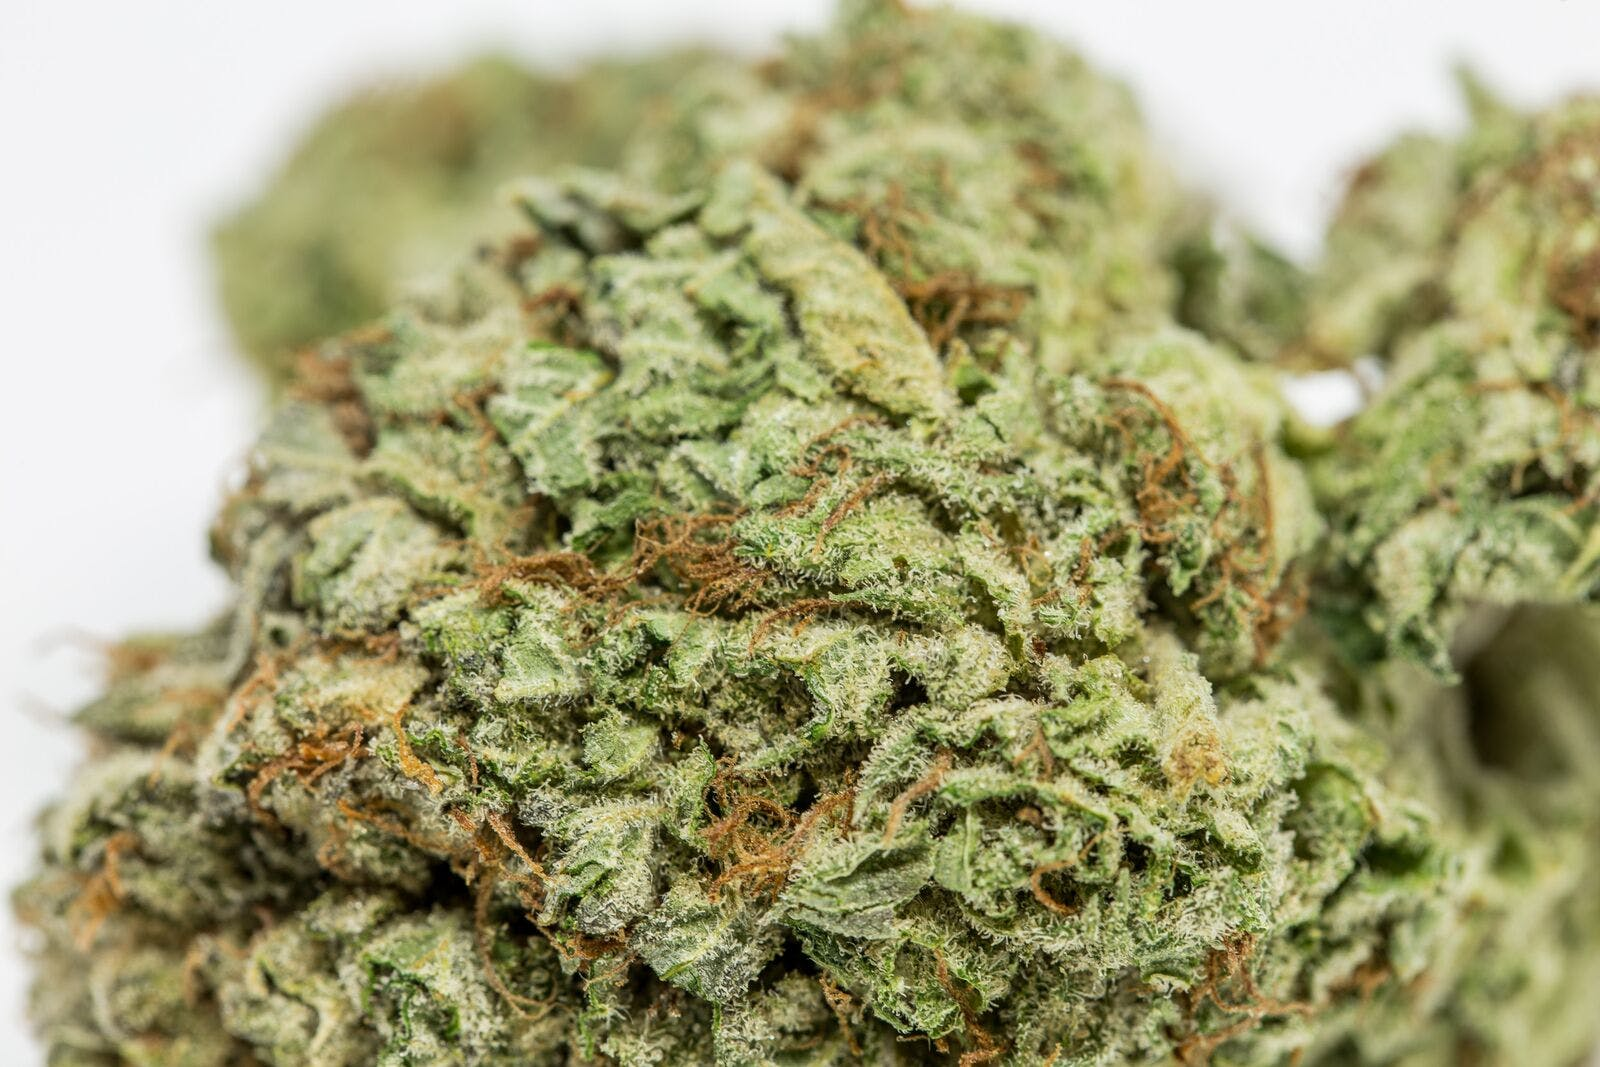 Venom OG Weed; Venom OG Cannabis Strain; Venom OG Hybrid Marijuana Strain